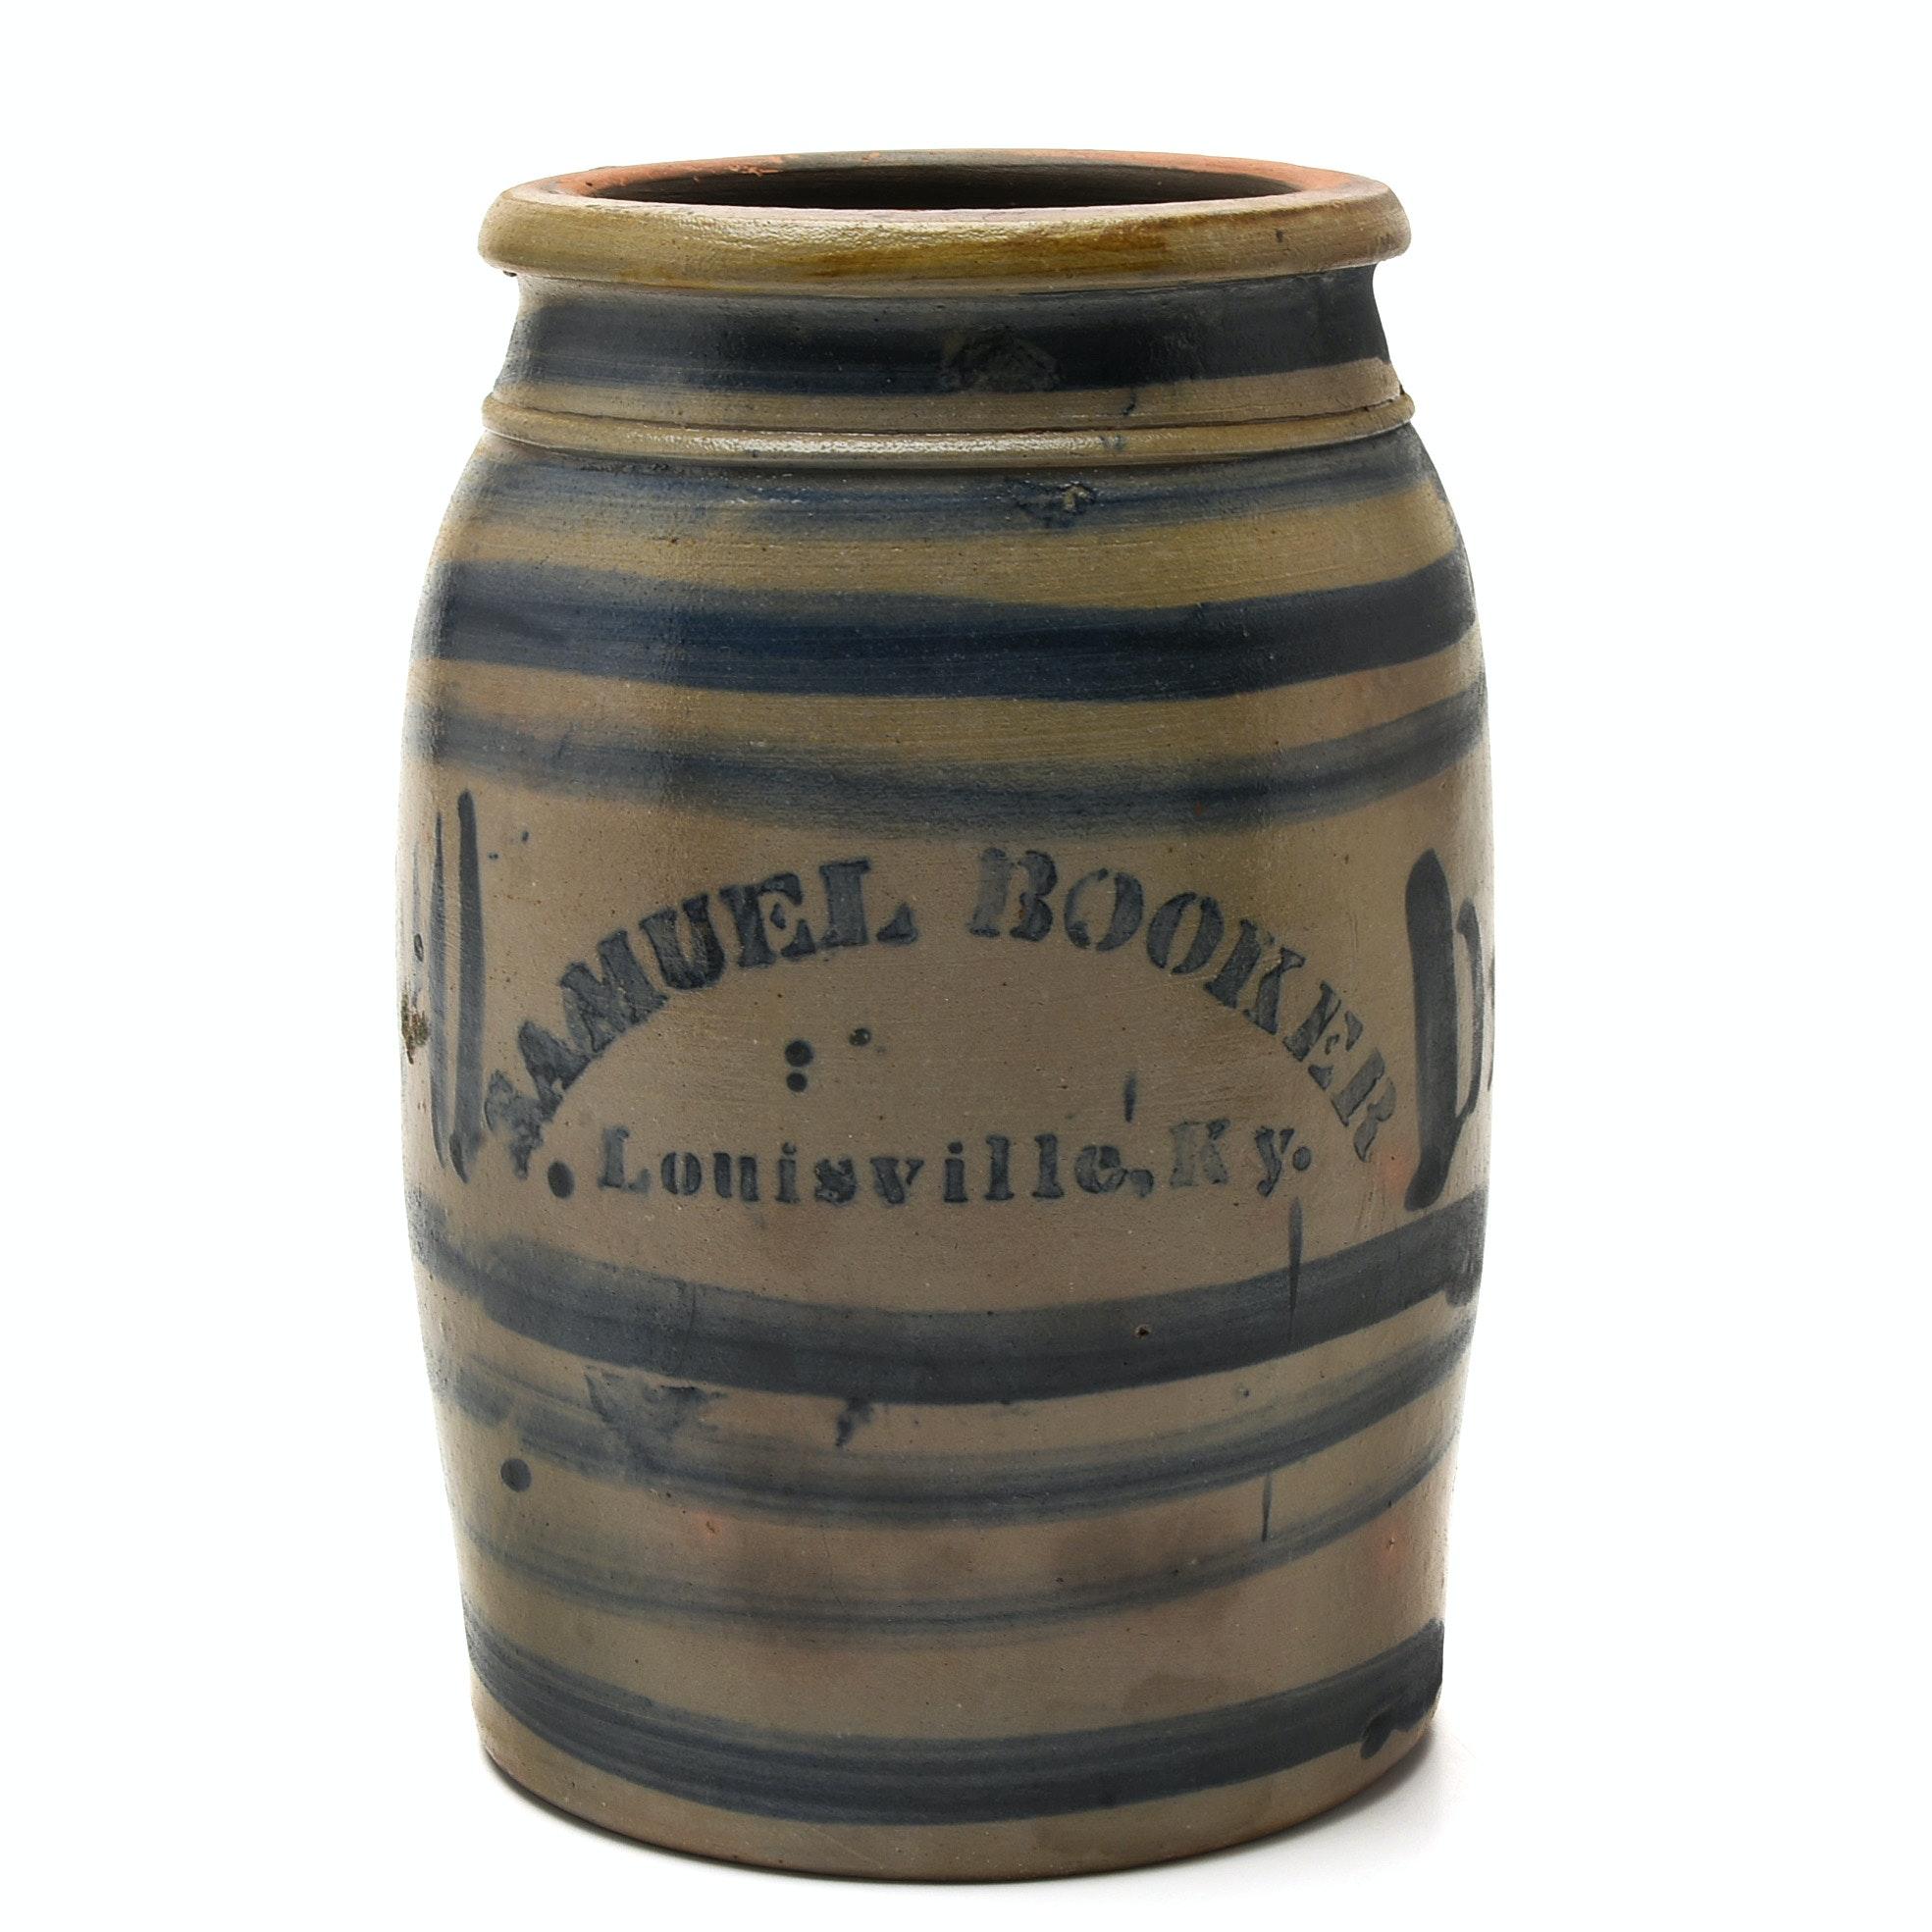 Samuel Booker 19th Century Kentucky Cobalt Decorated Stoneware Jar